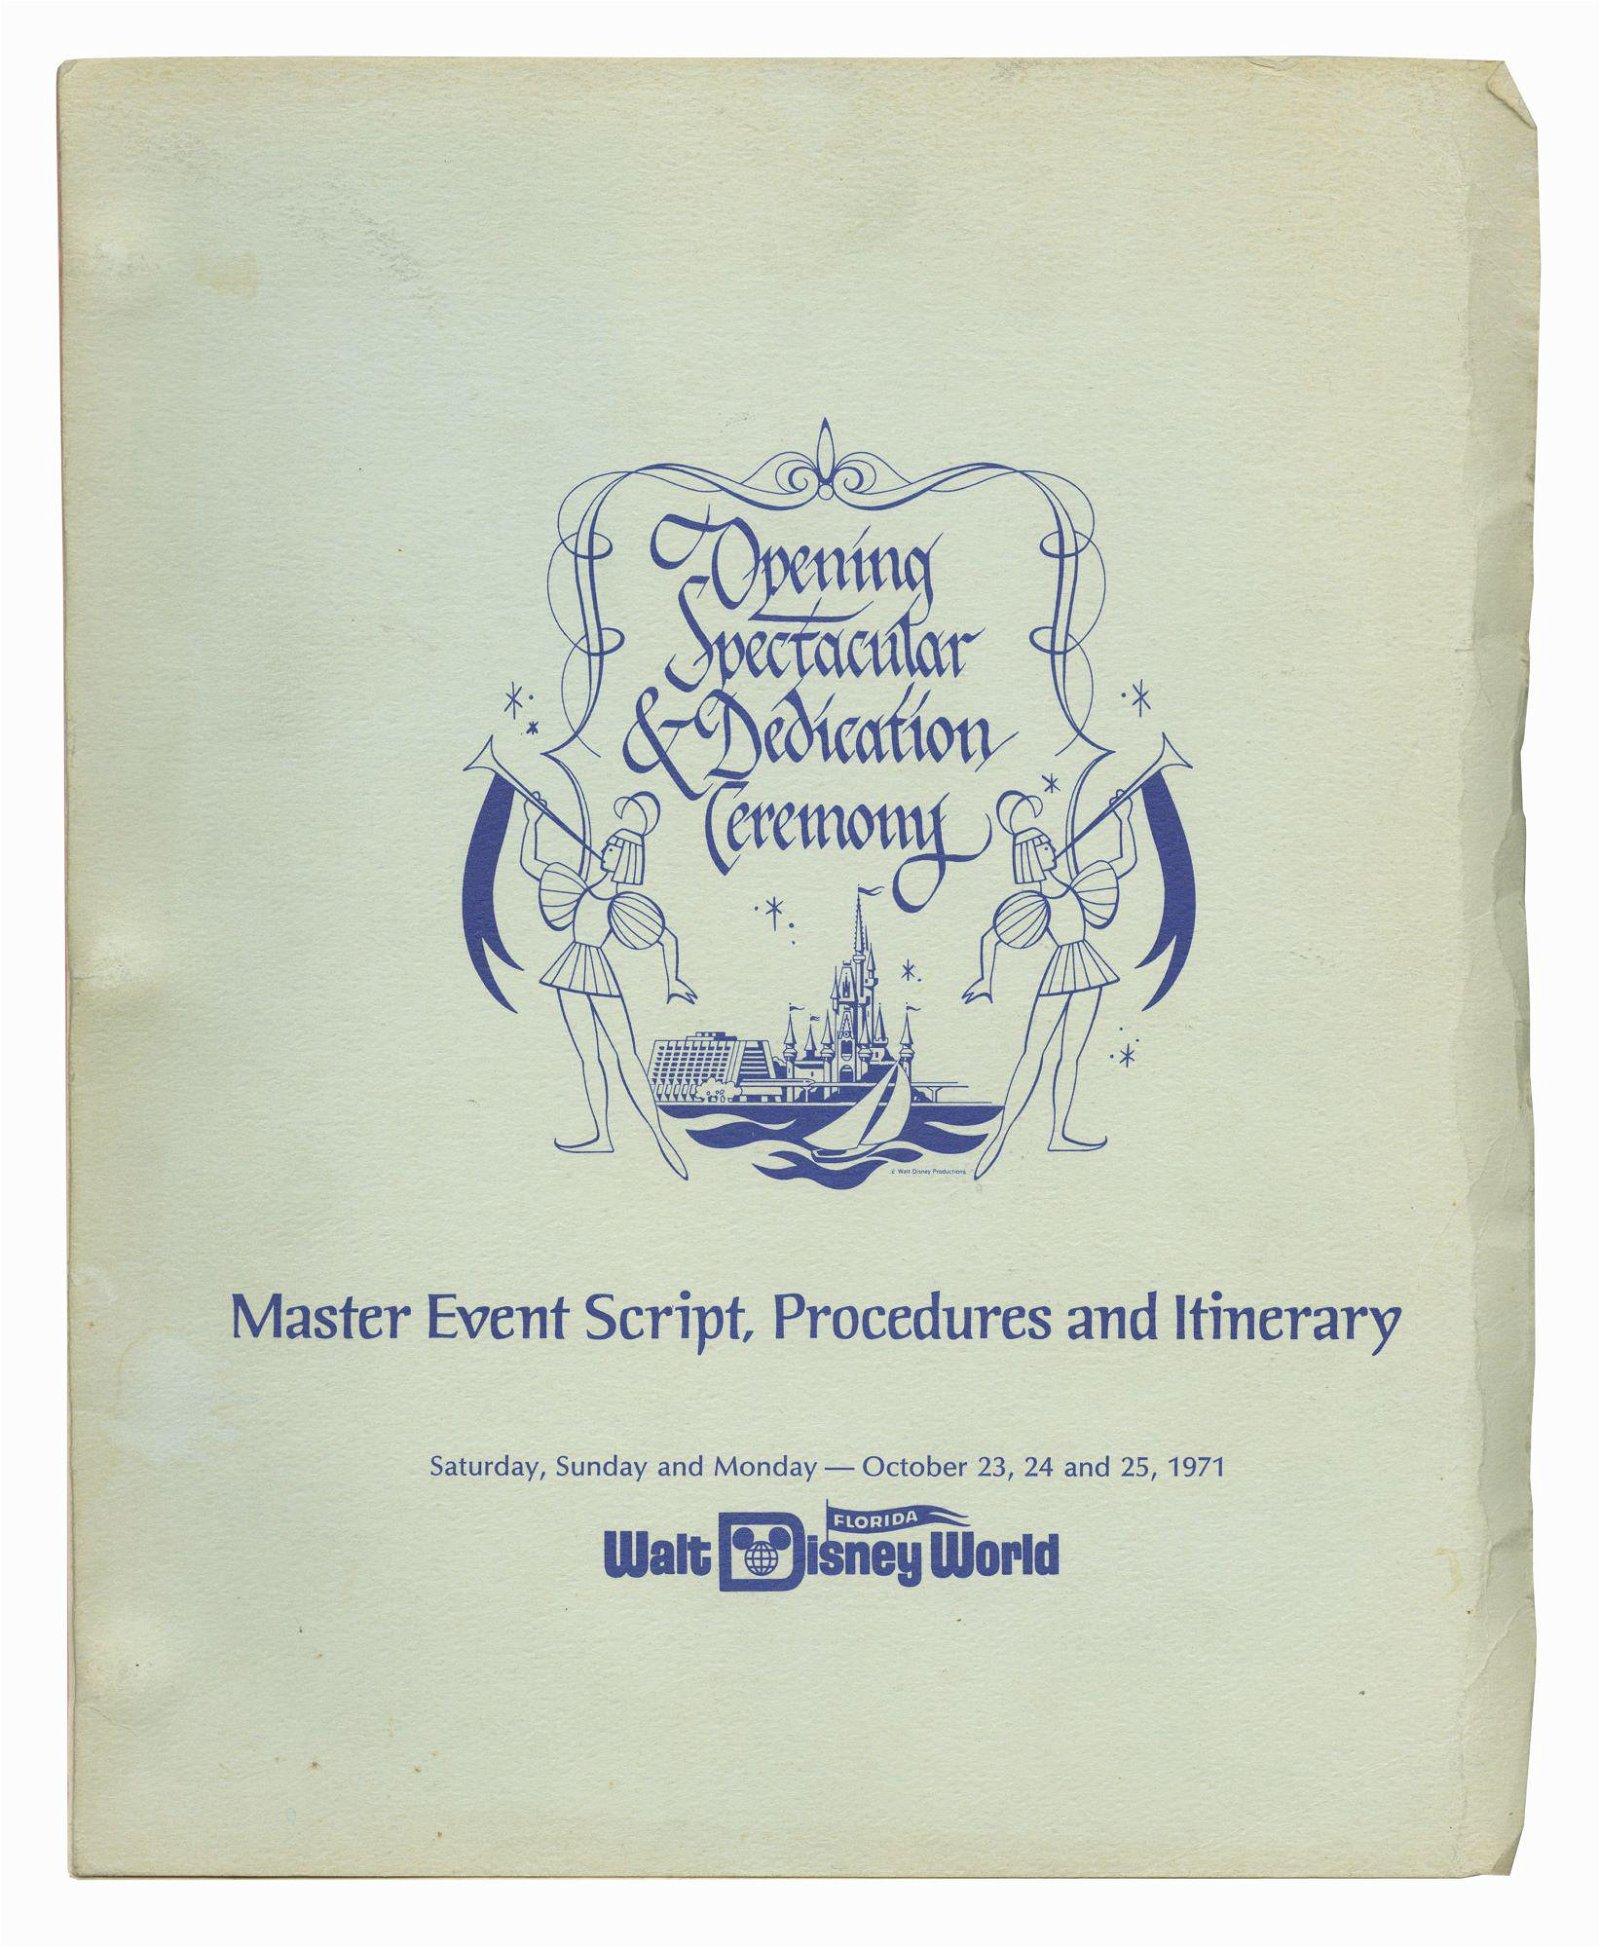 Grand Opening Spectacular Master Event Script.